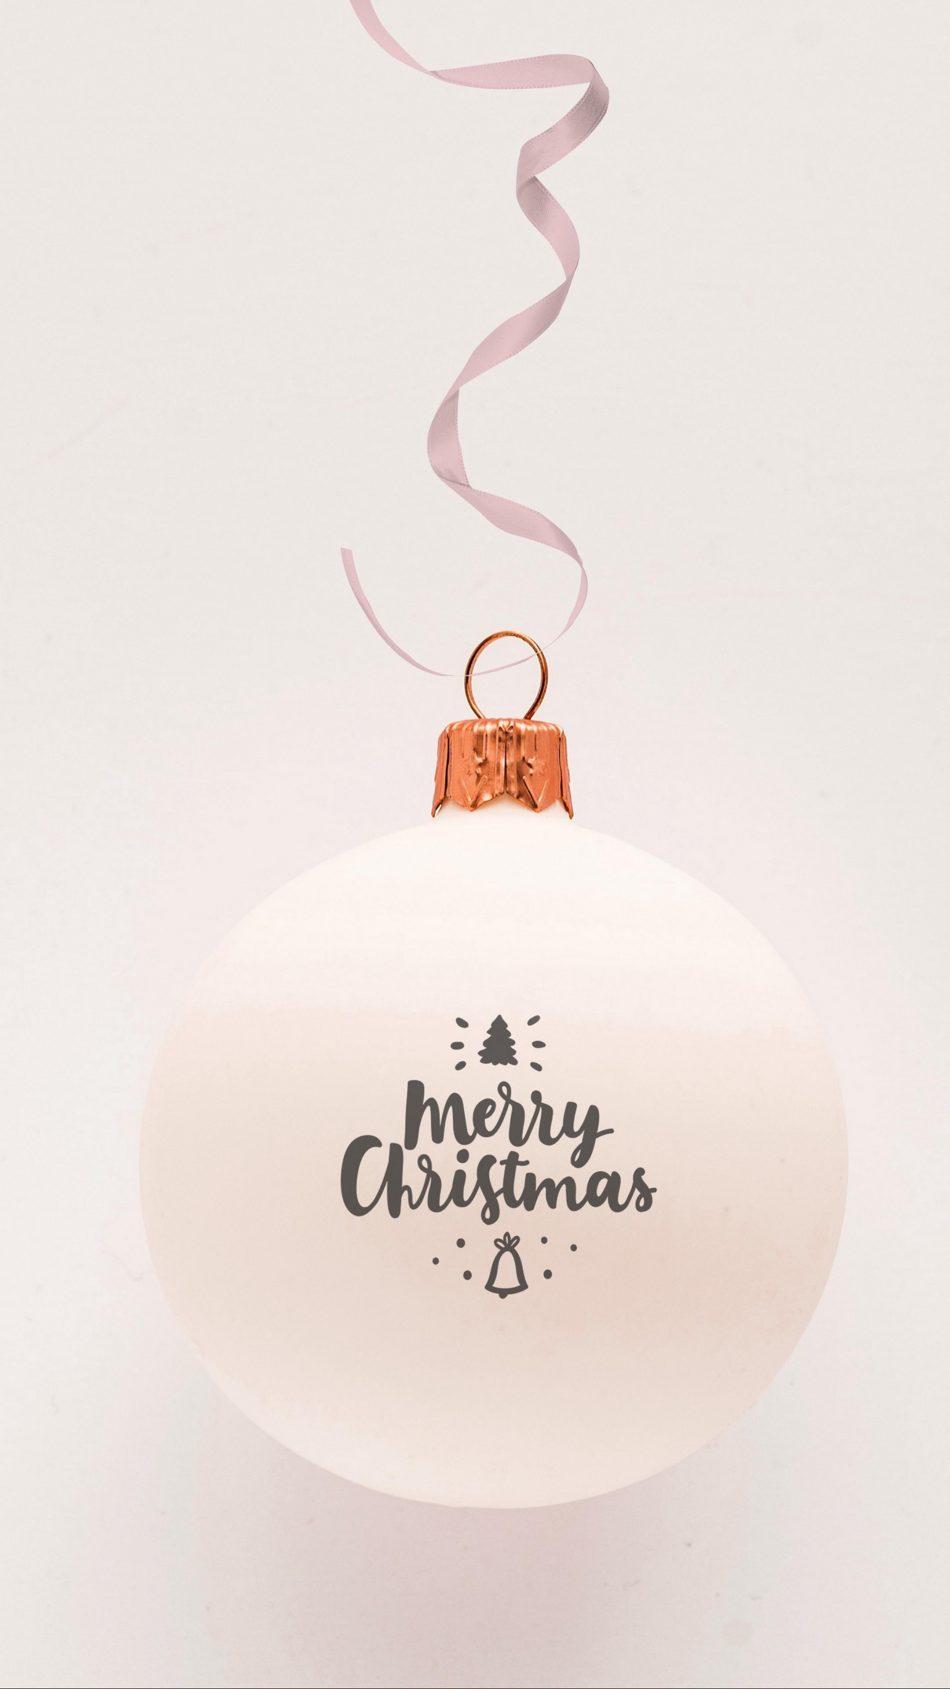 Merry Christmas Ball Ornament White Background 4K Ultra HD Mobile Wallpaper